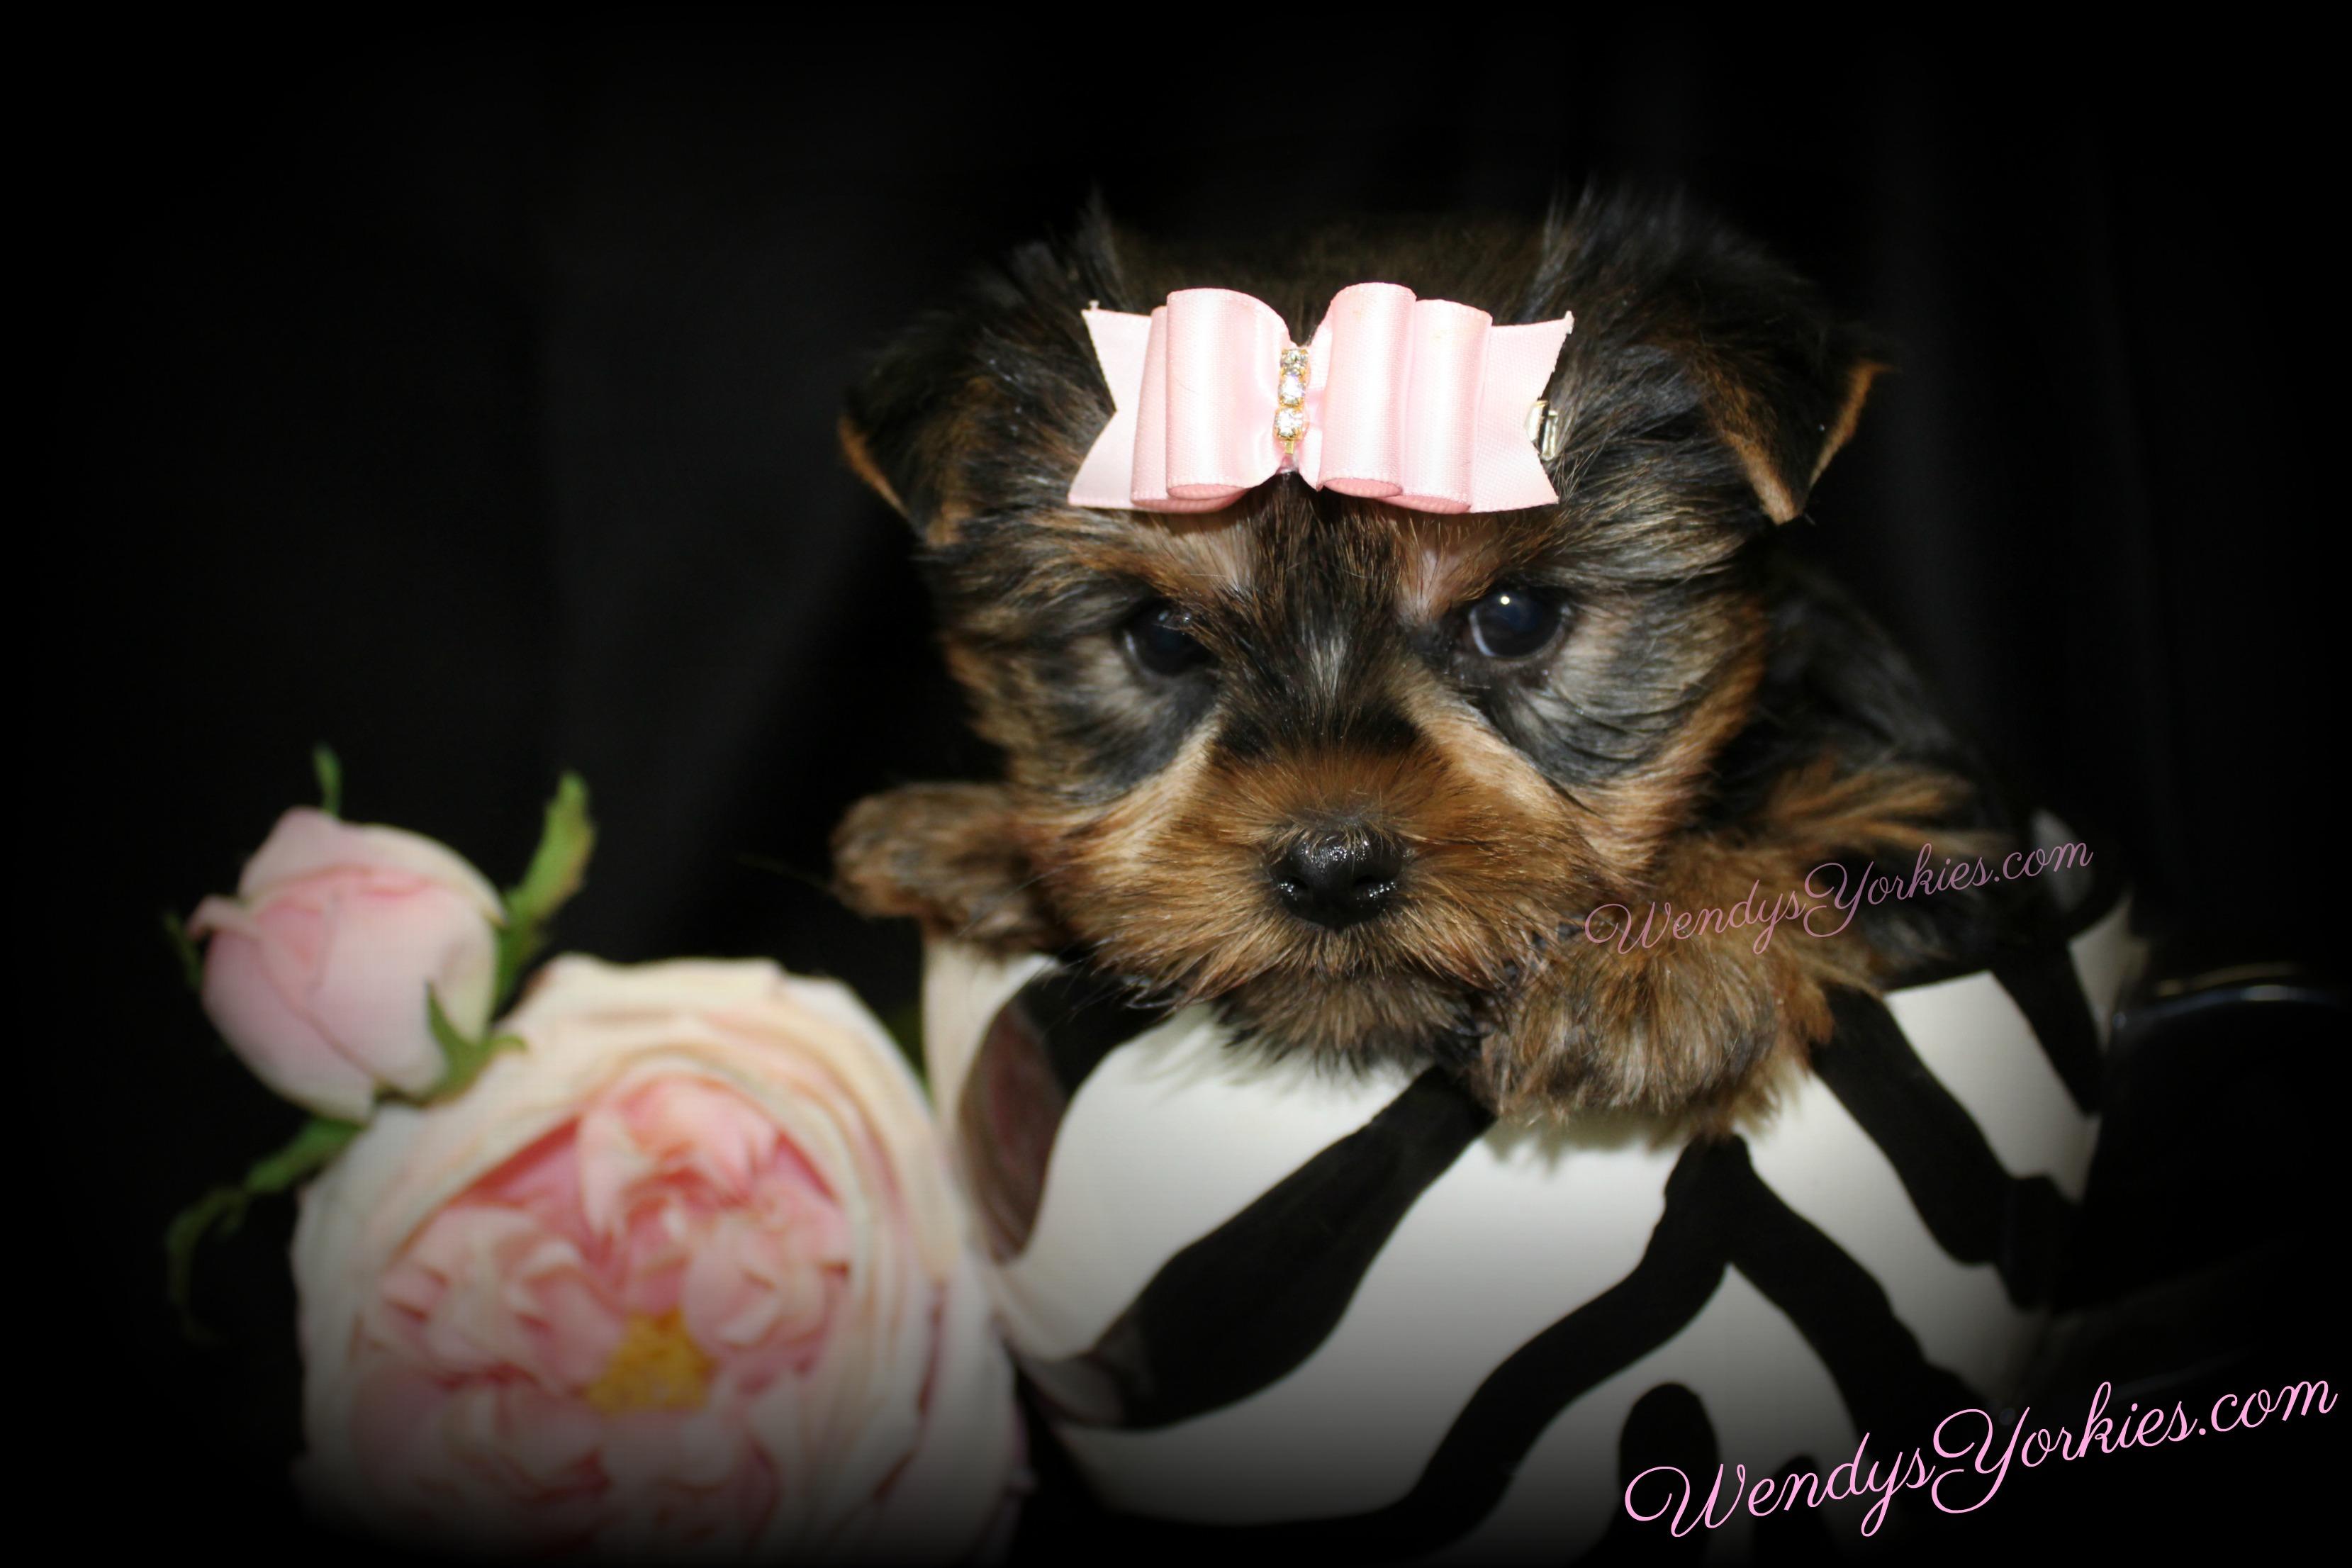 Teacup Female Yorkie puppy for sale, Toy Yorkie, WendysYorkies.com, Star f1